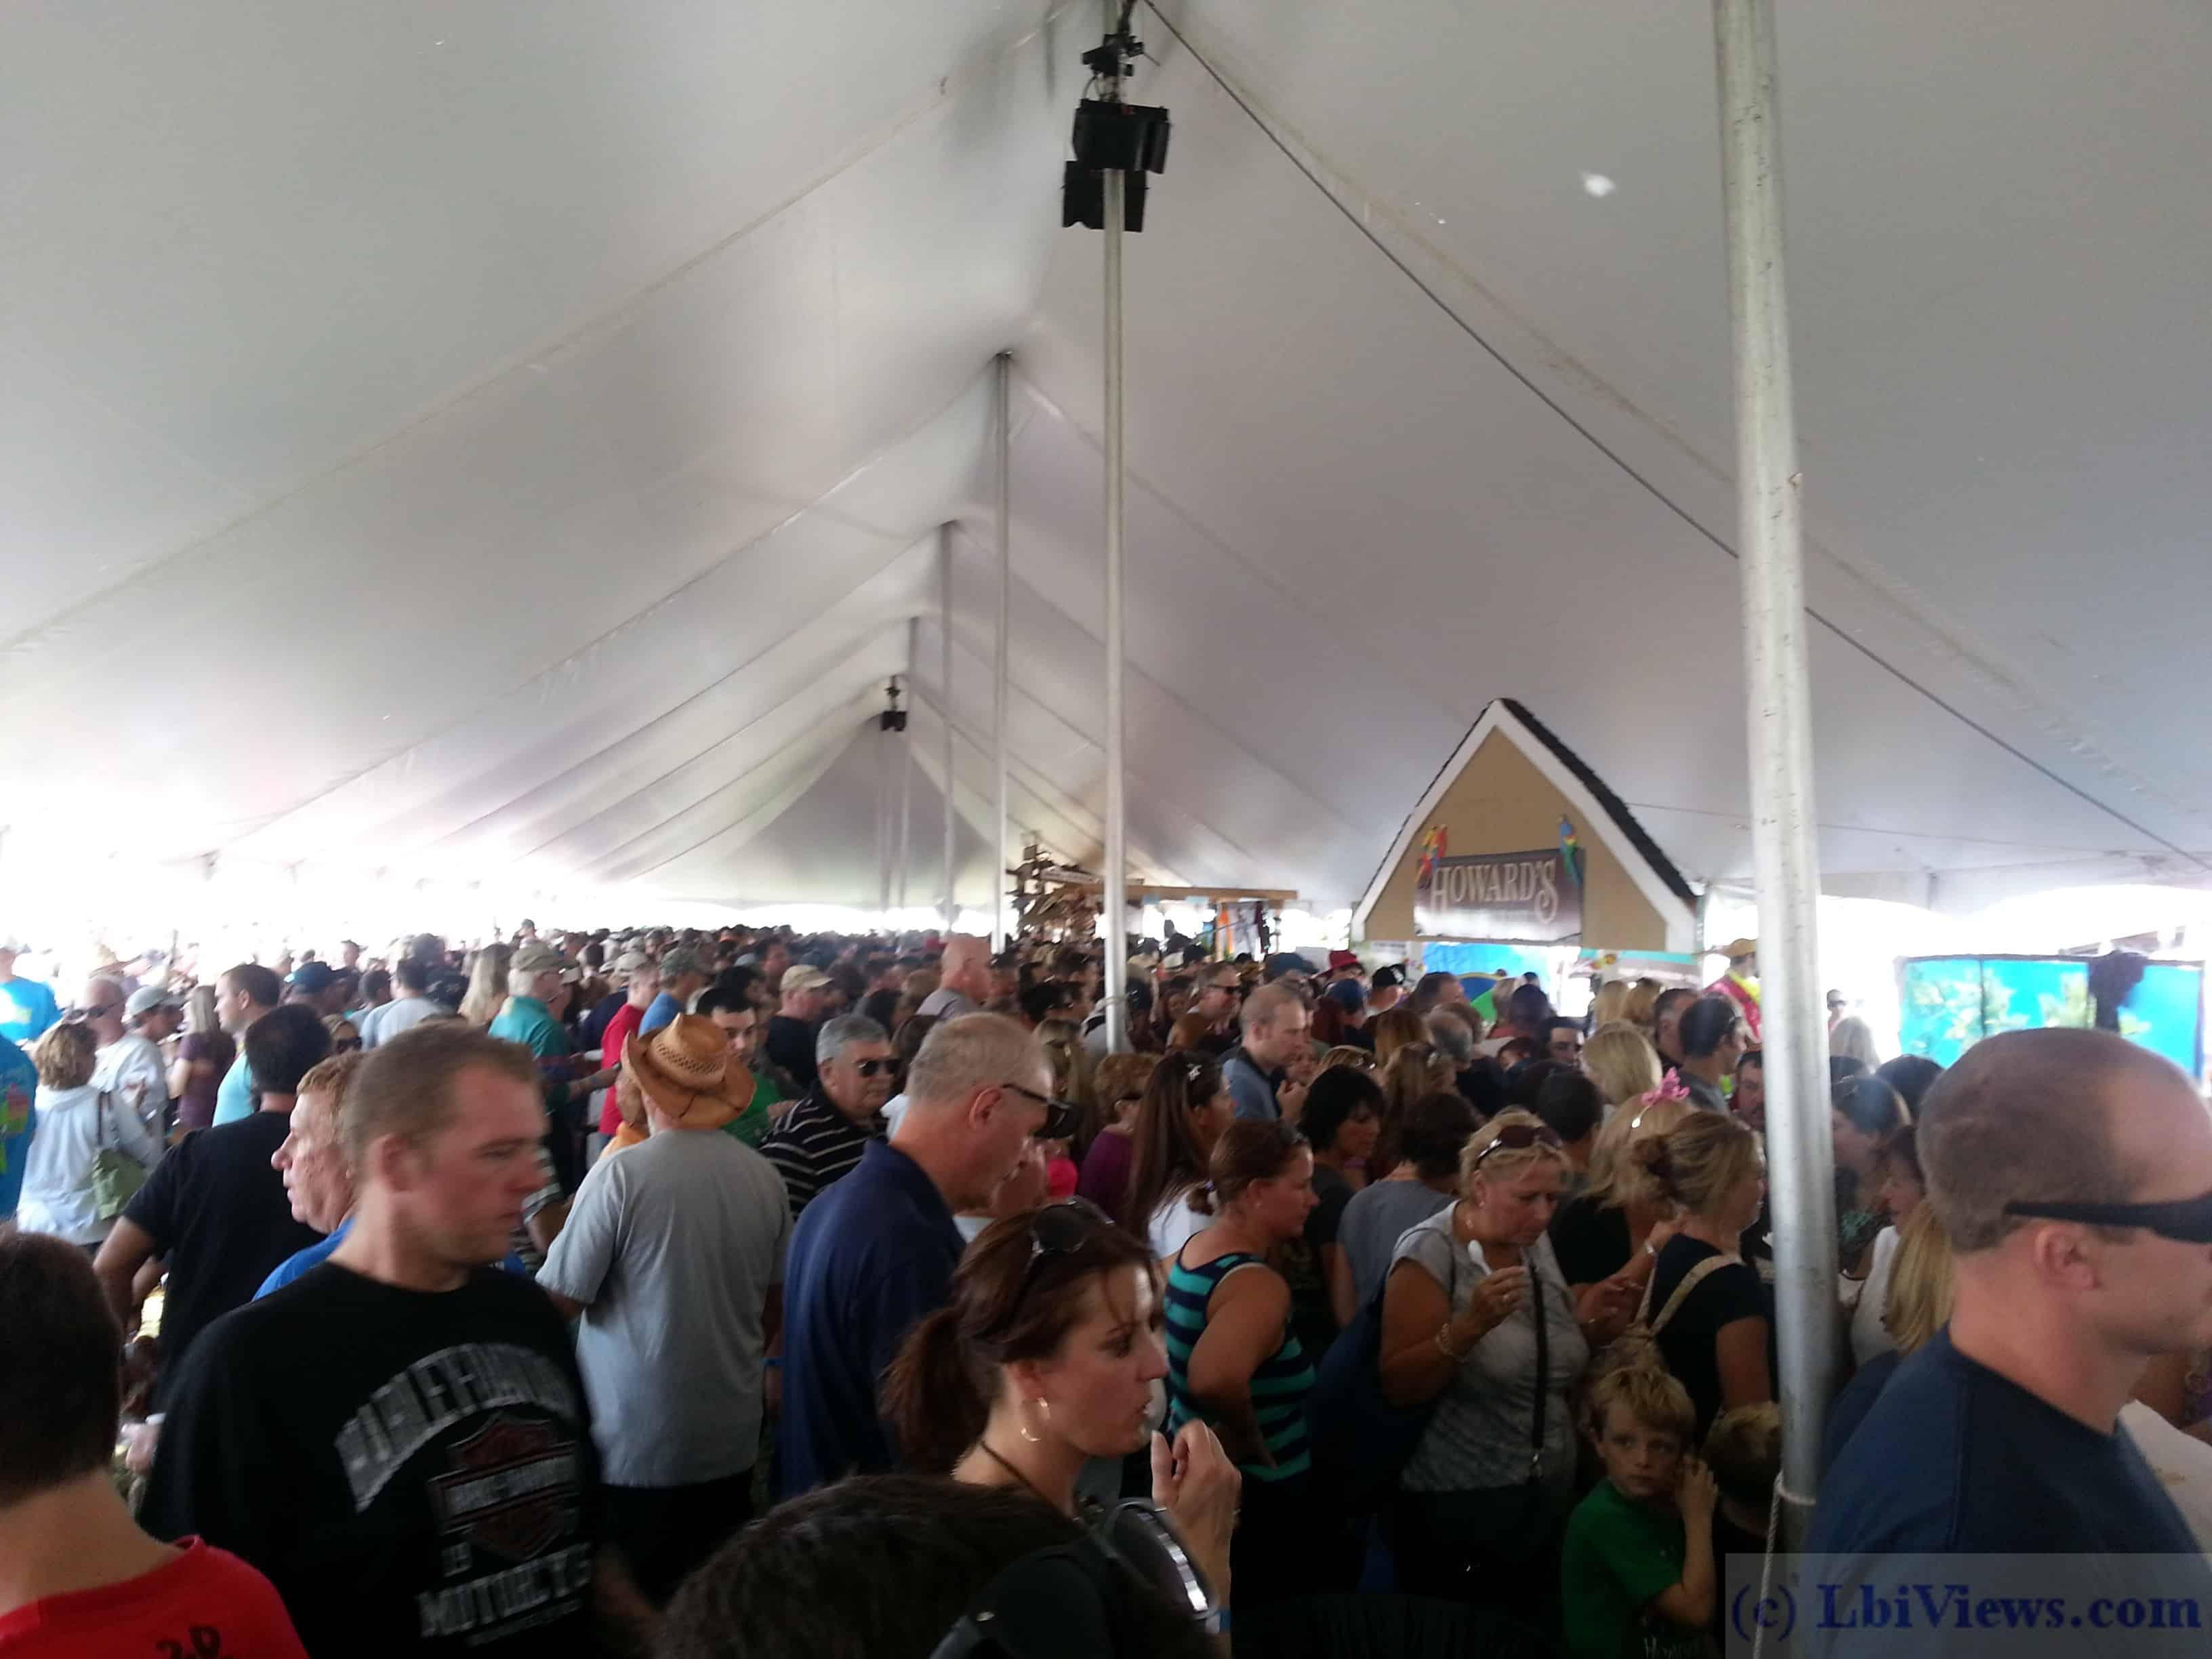 Chowderfest 2012